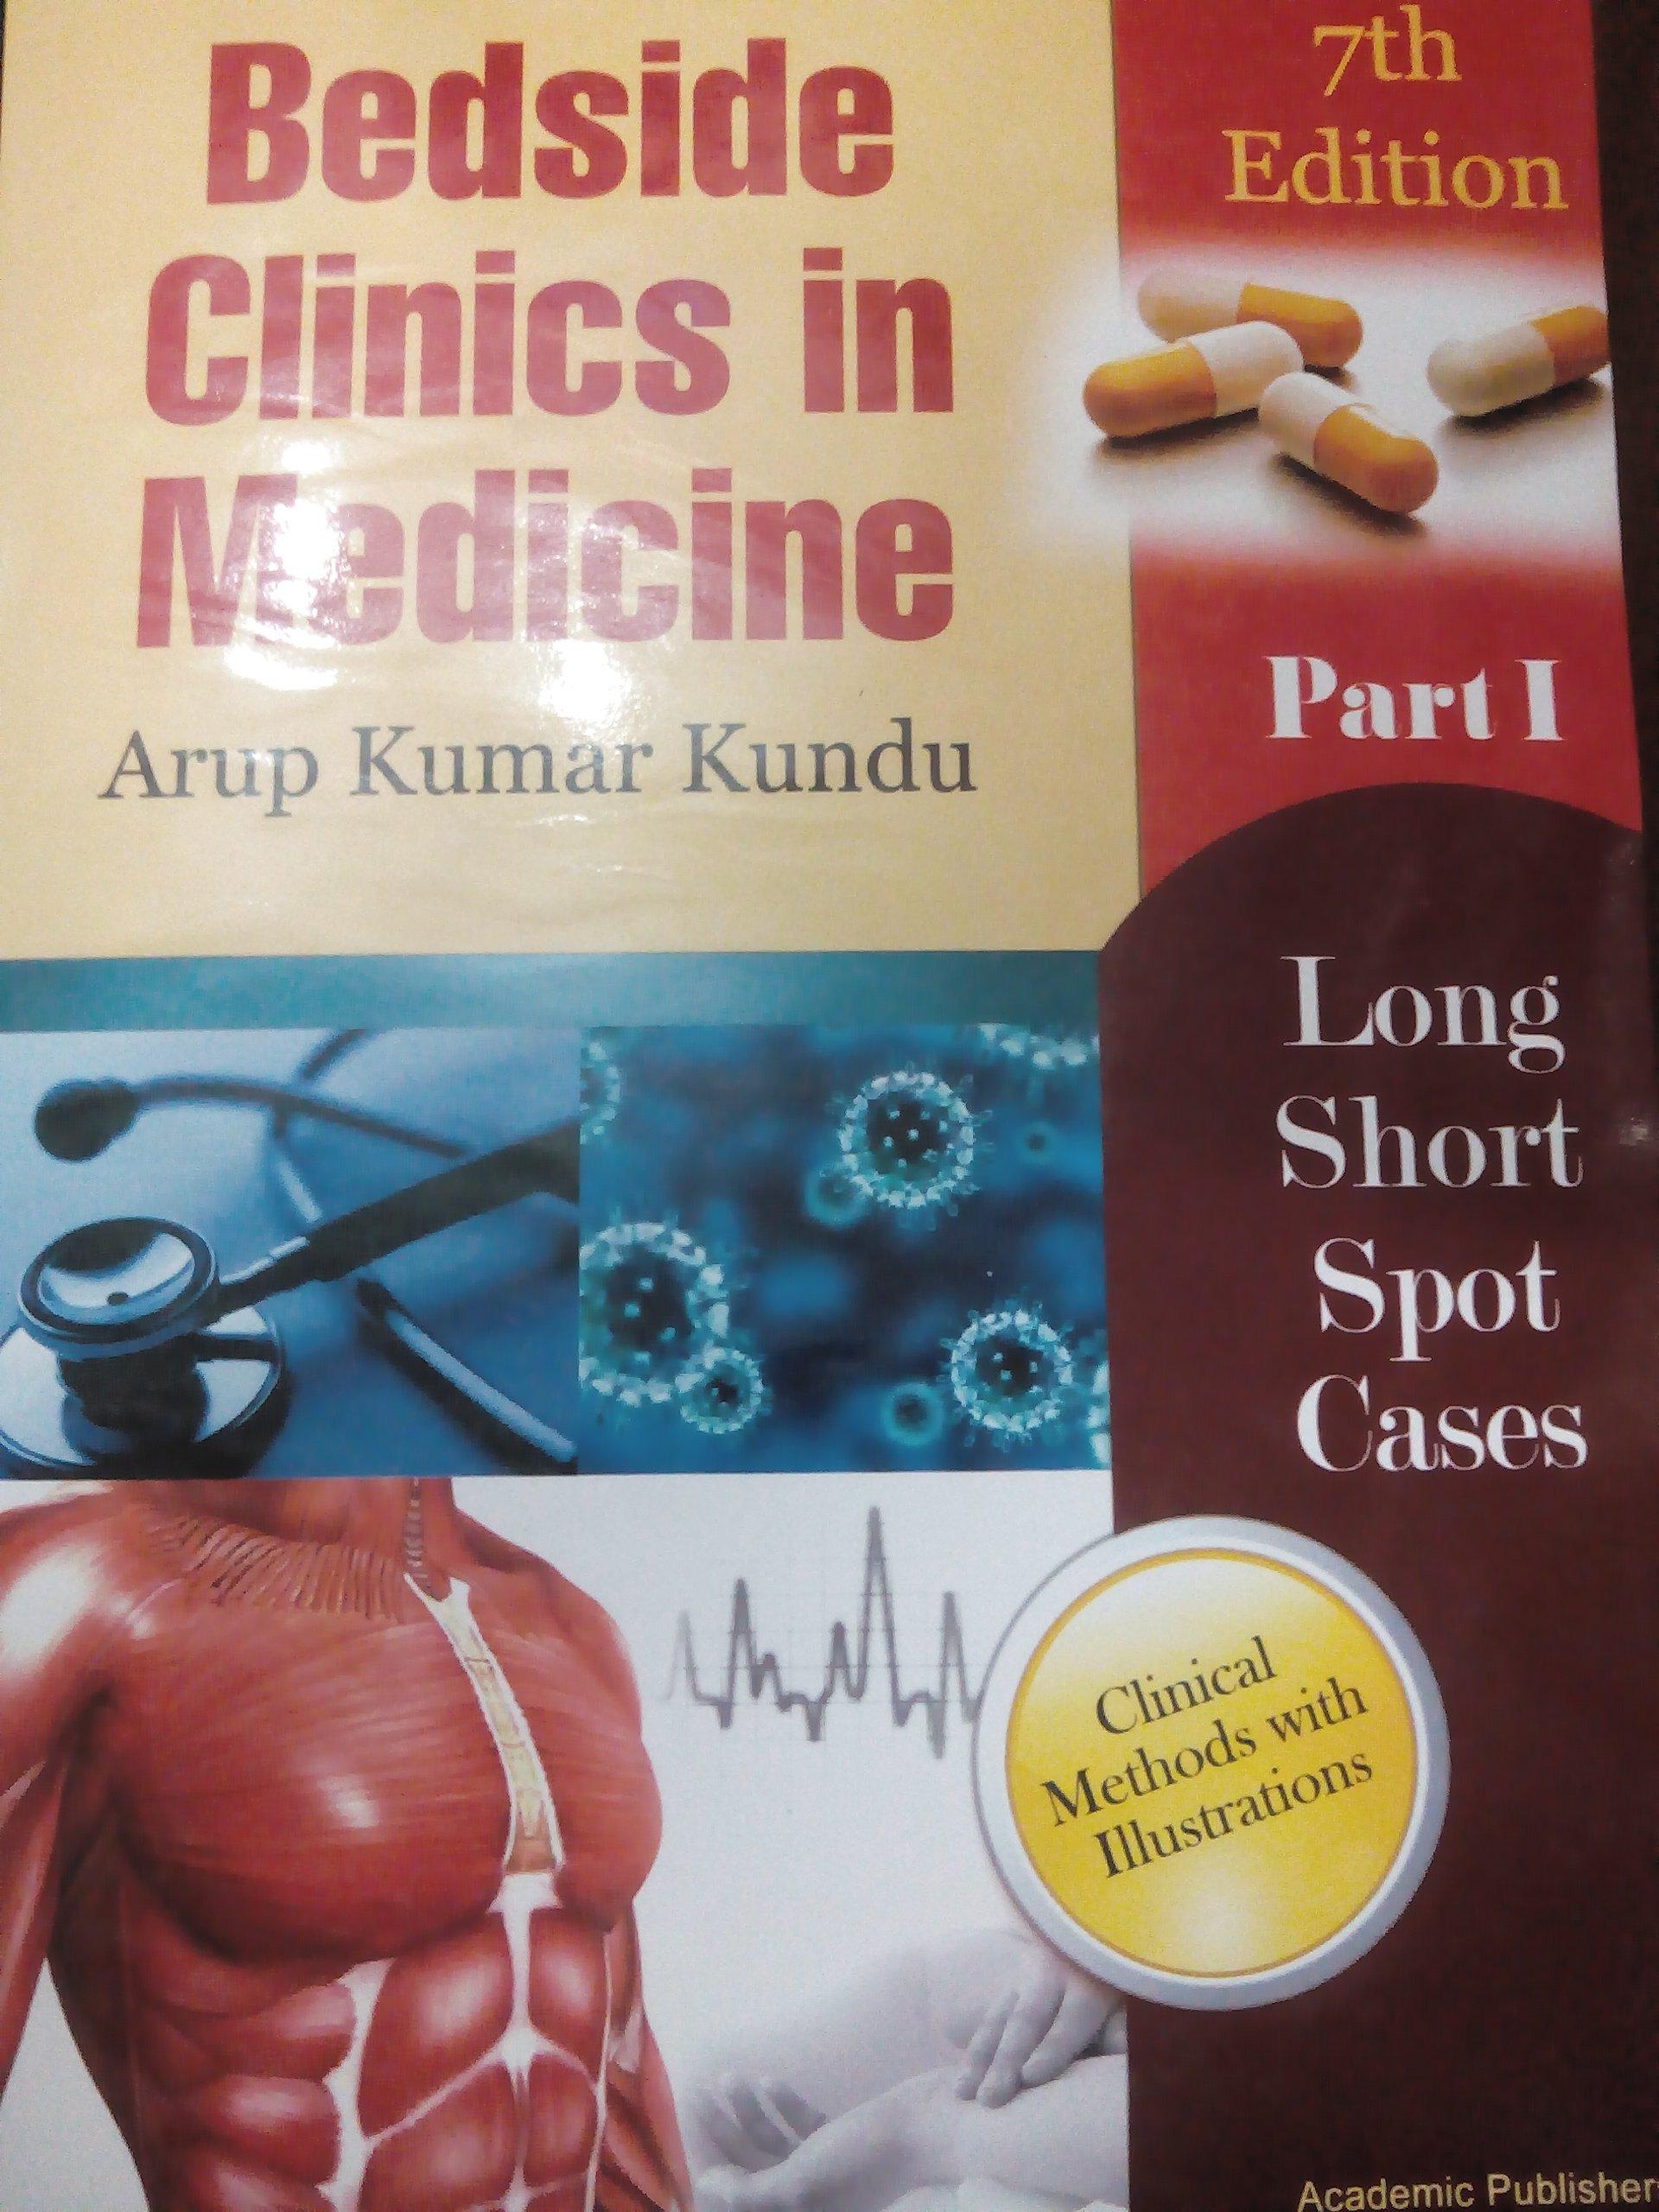 Buy Bedside Clinics In Medicine Part 1 Kundu 7th